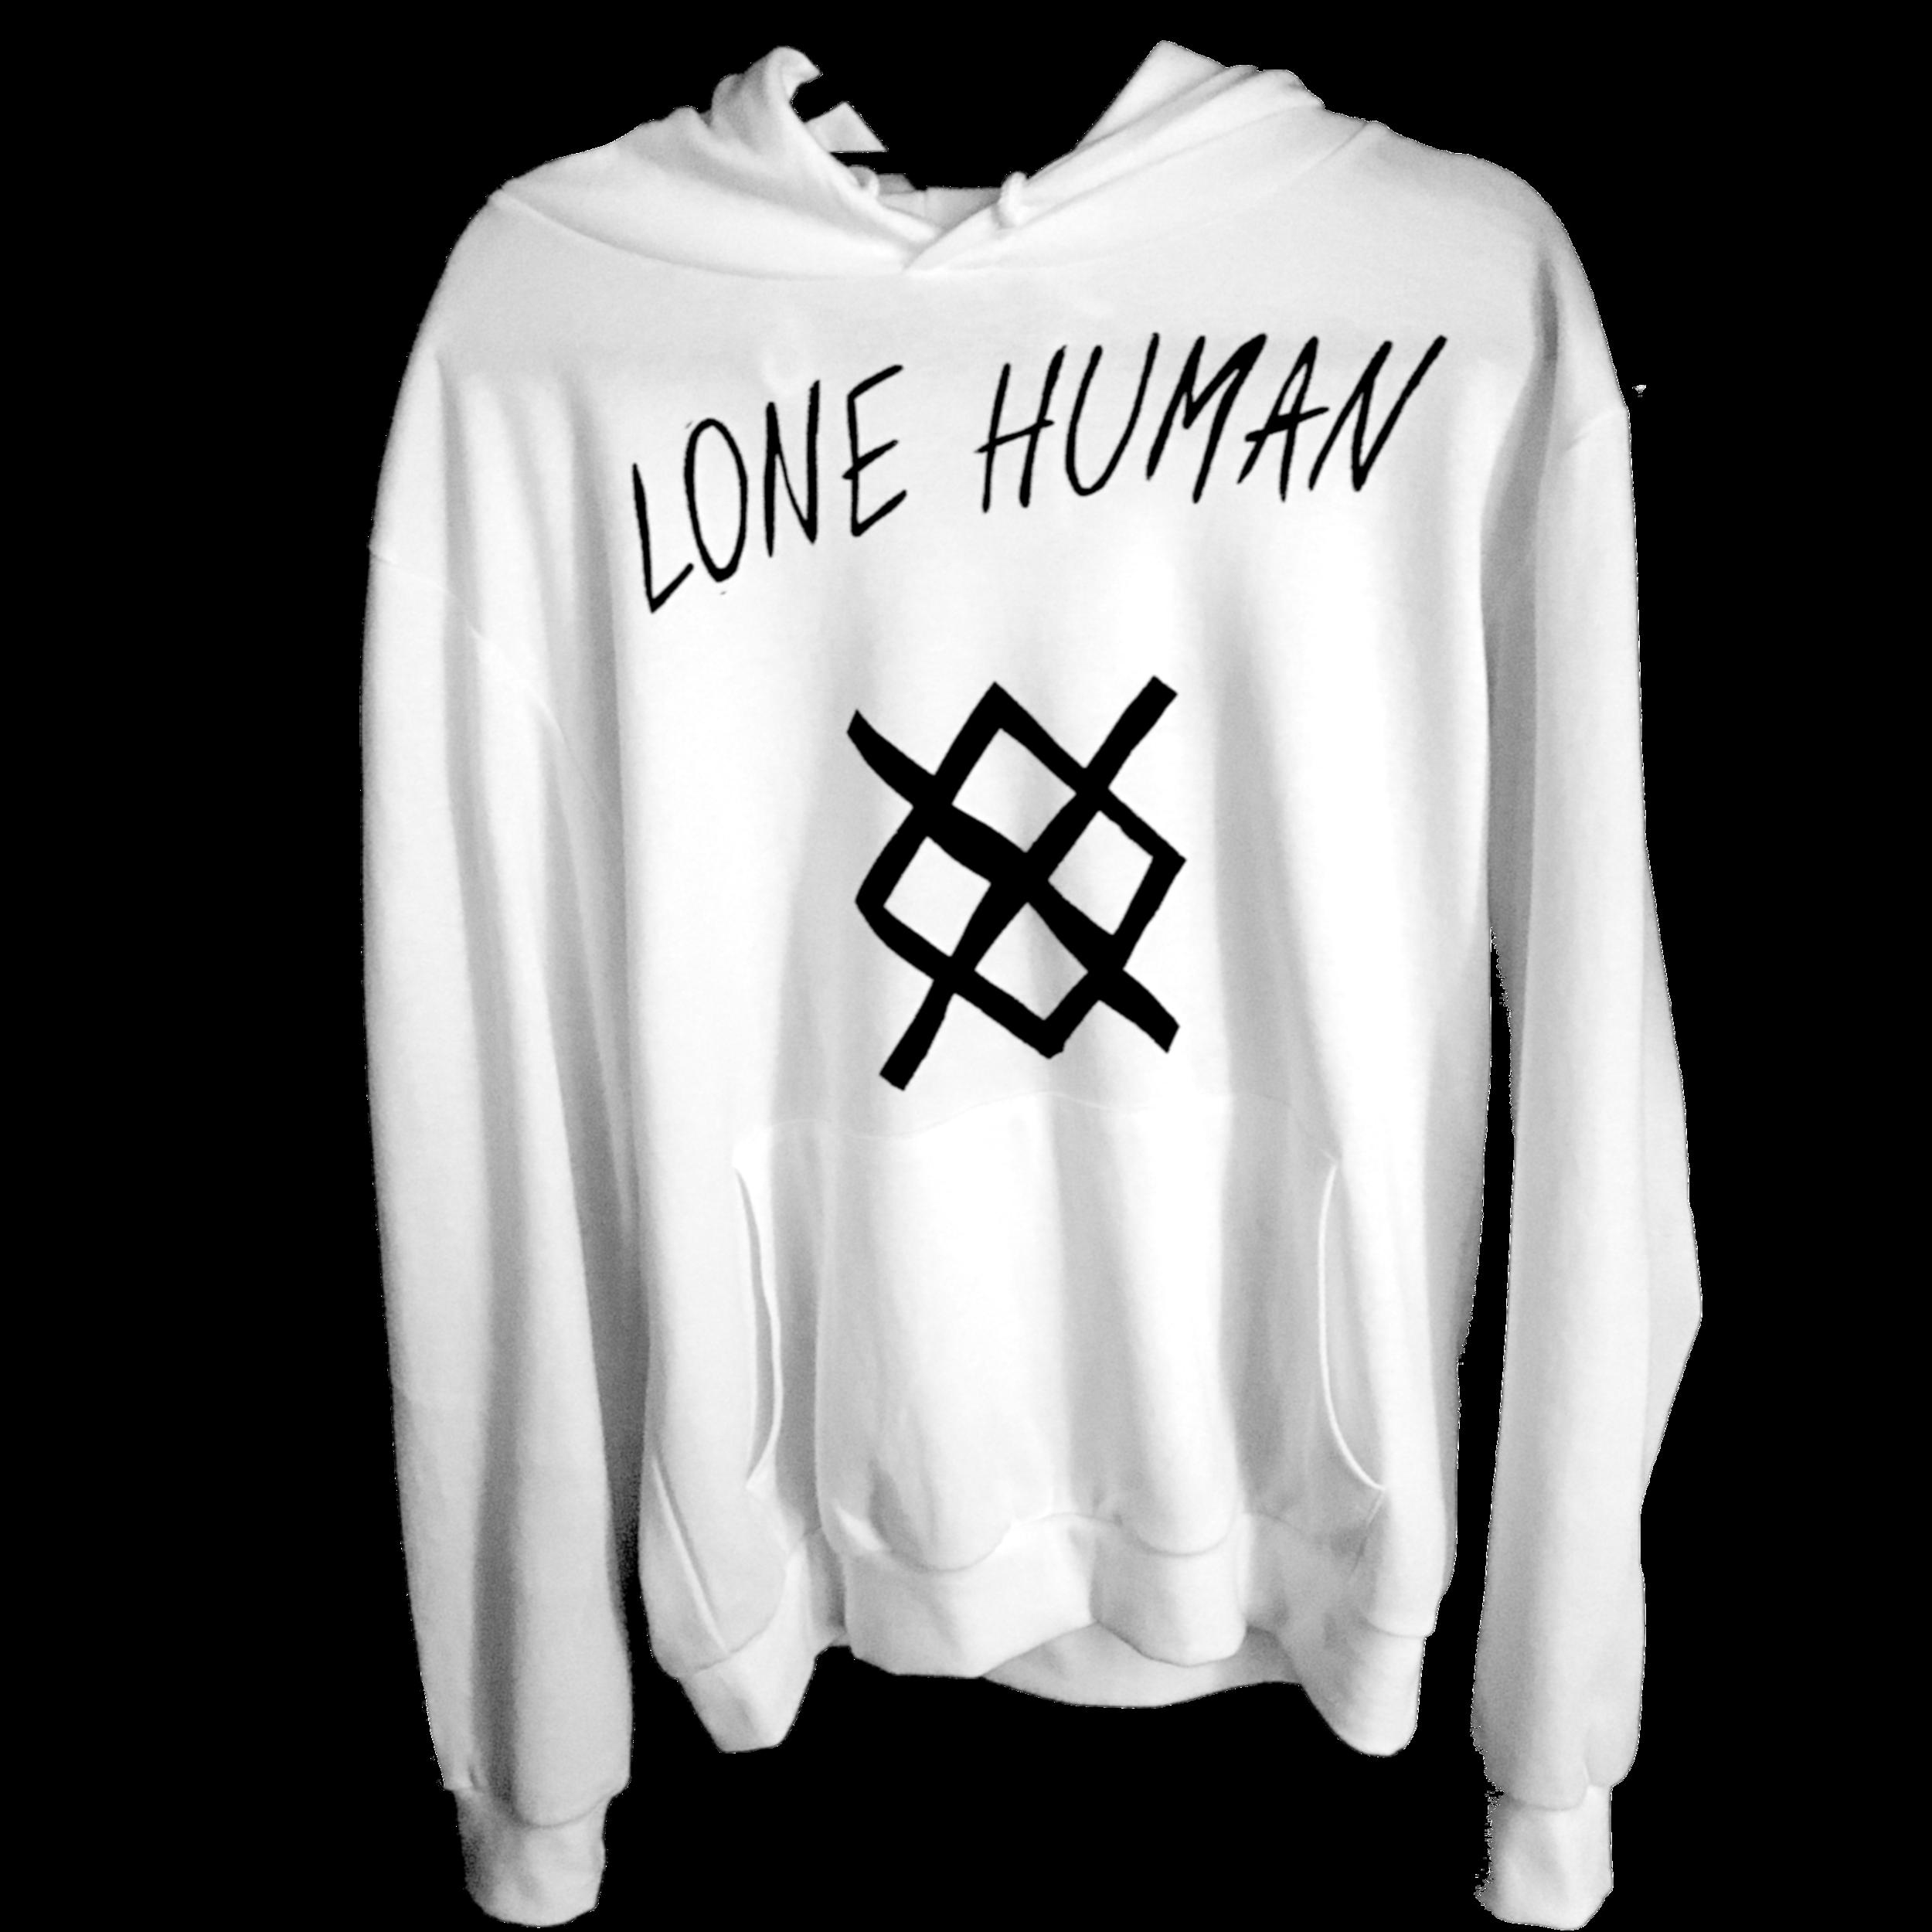 Lone Human Sweatshirts - Available soon